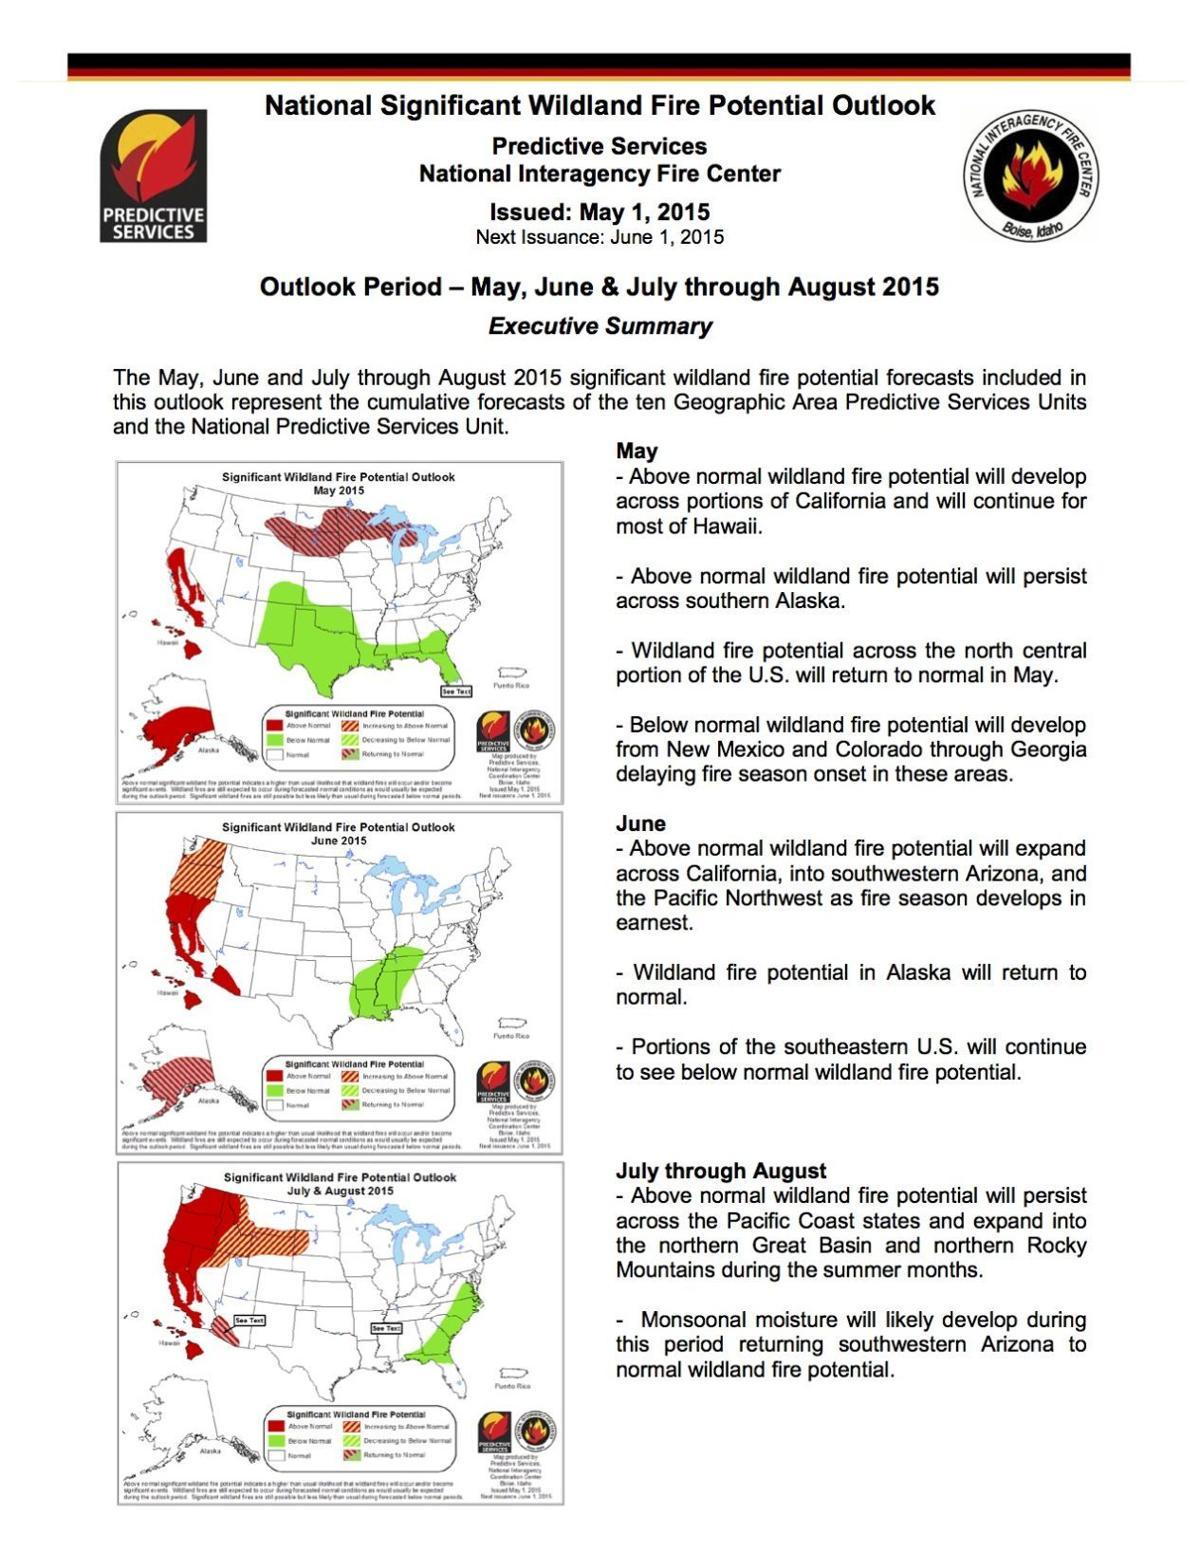 Grassland fire danger worsens in June